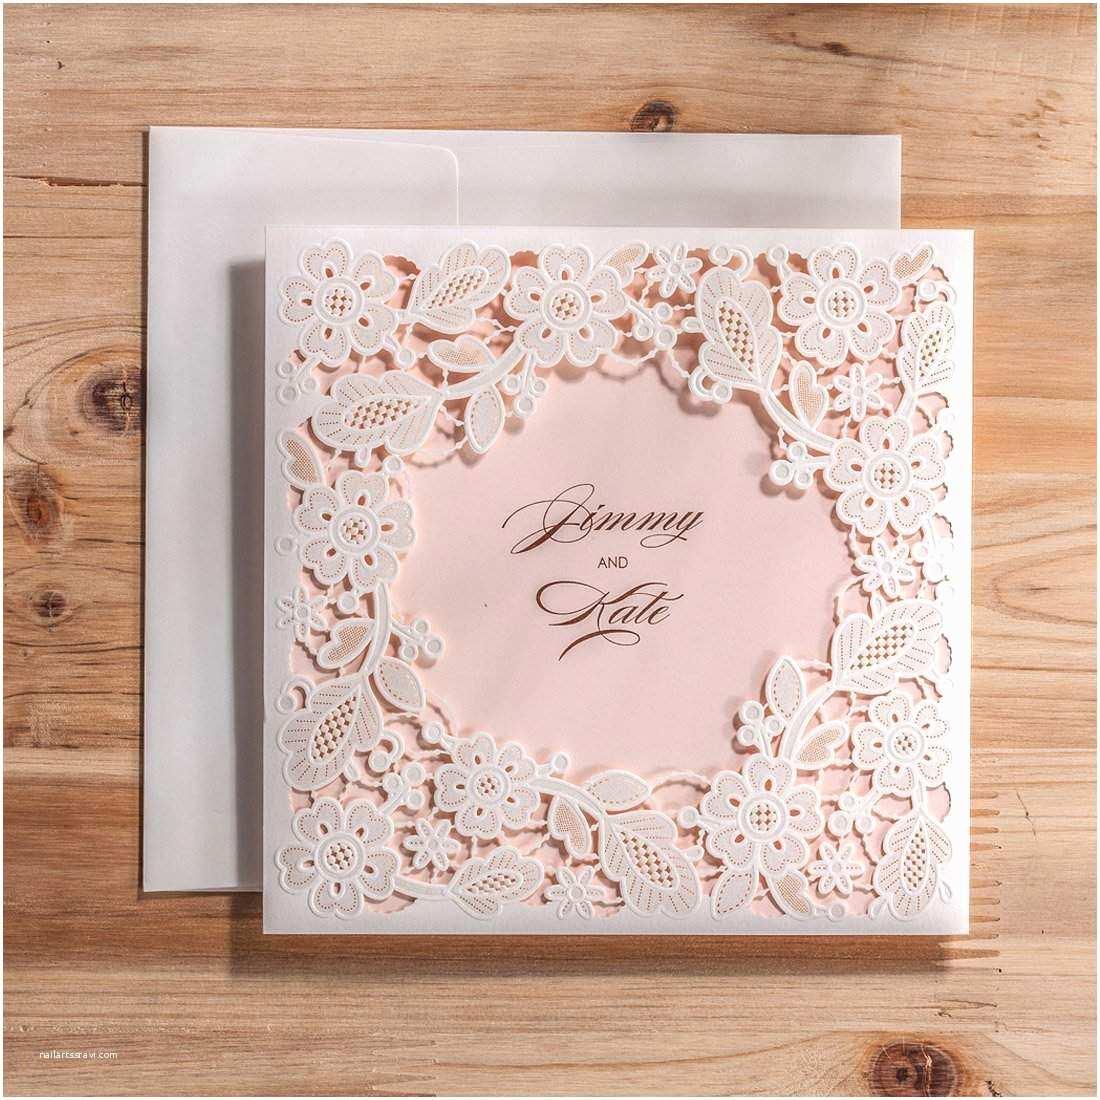 Wedding Invitation Kits top 10 Best Cheap Diy Wedding Invitations